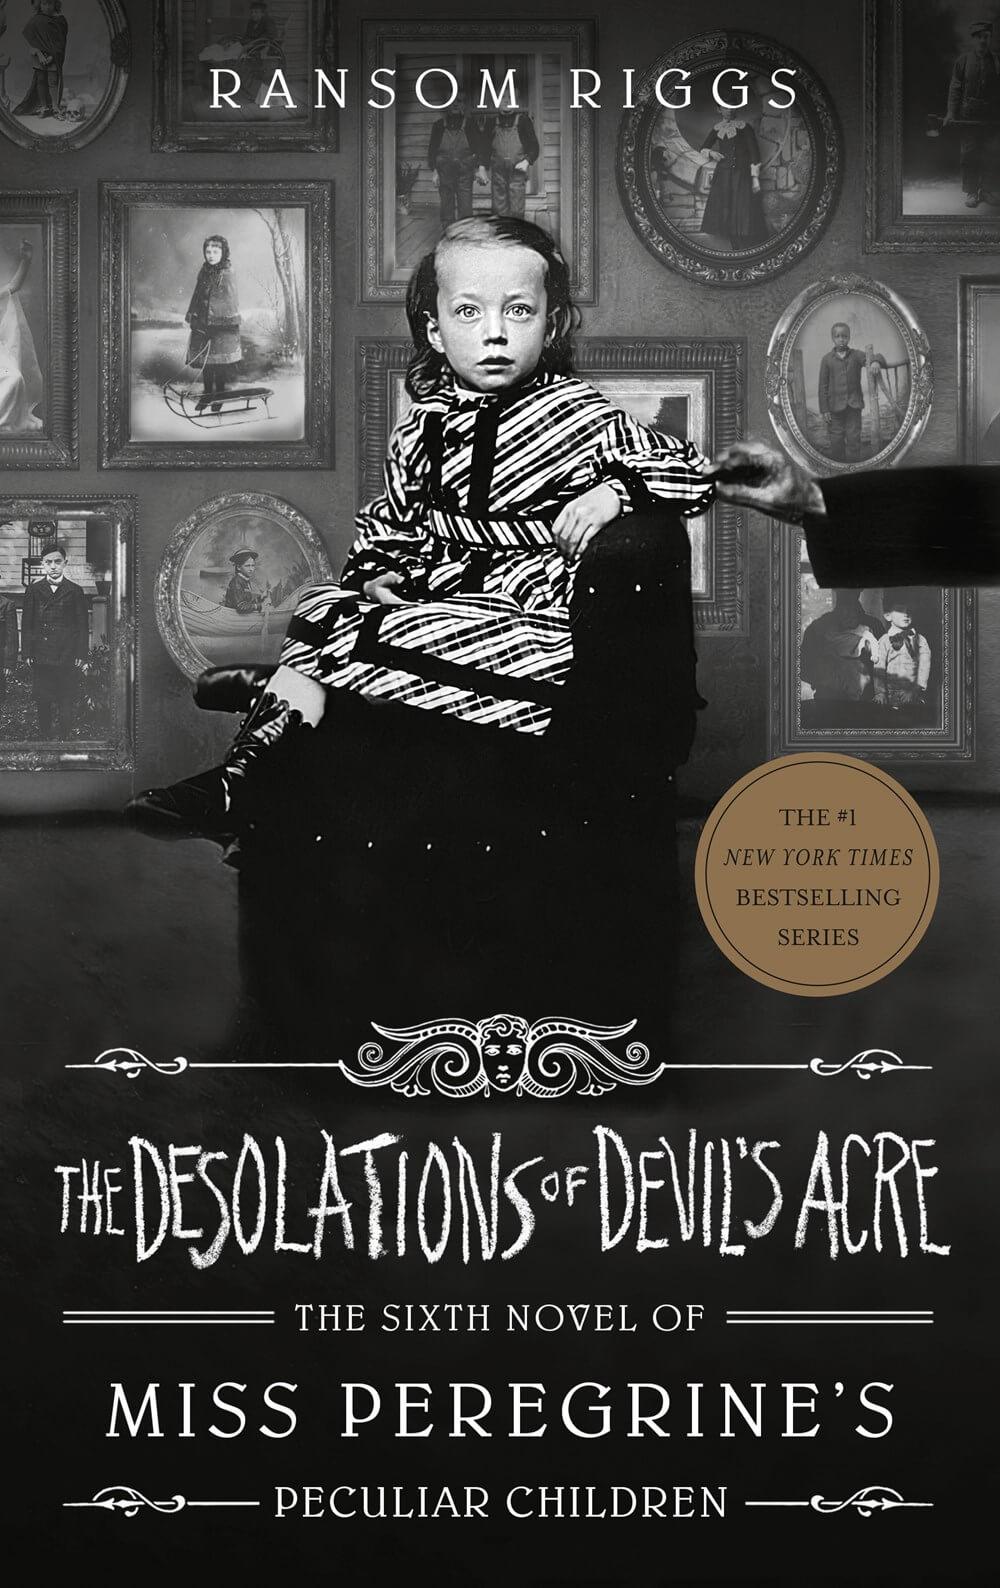 The Desolations of Devil's Acre ( Miss Peregrine's Peculiar Children )